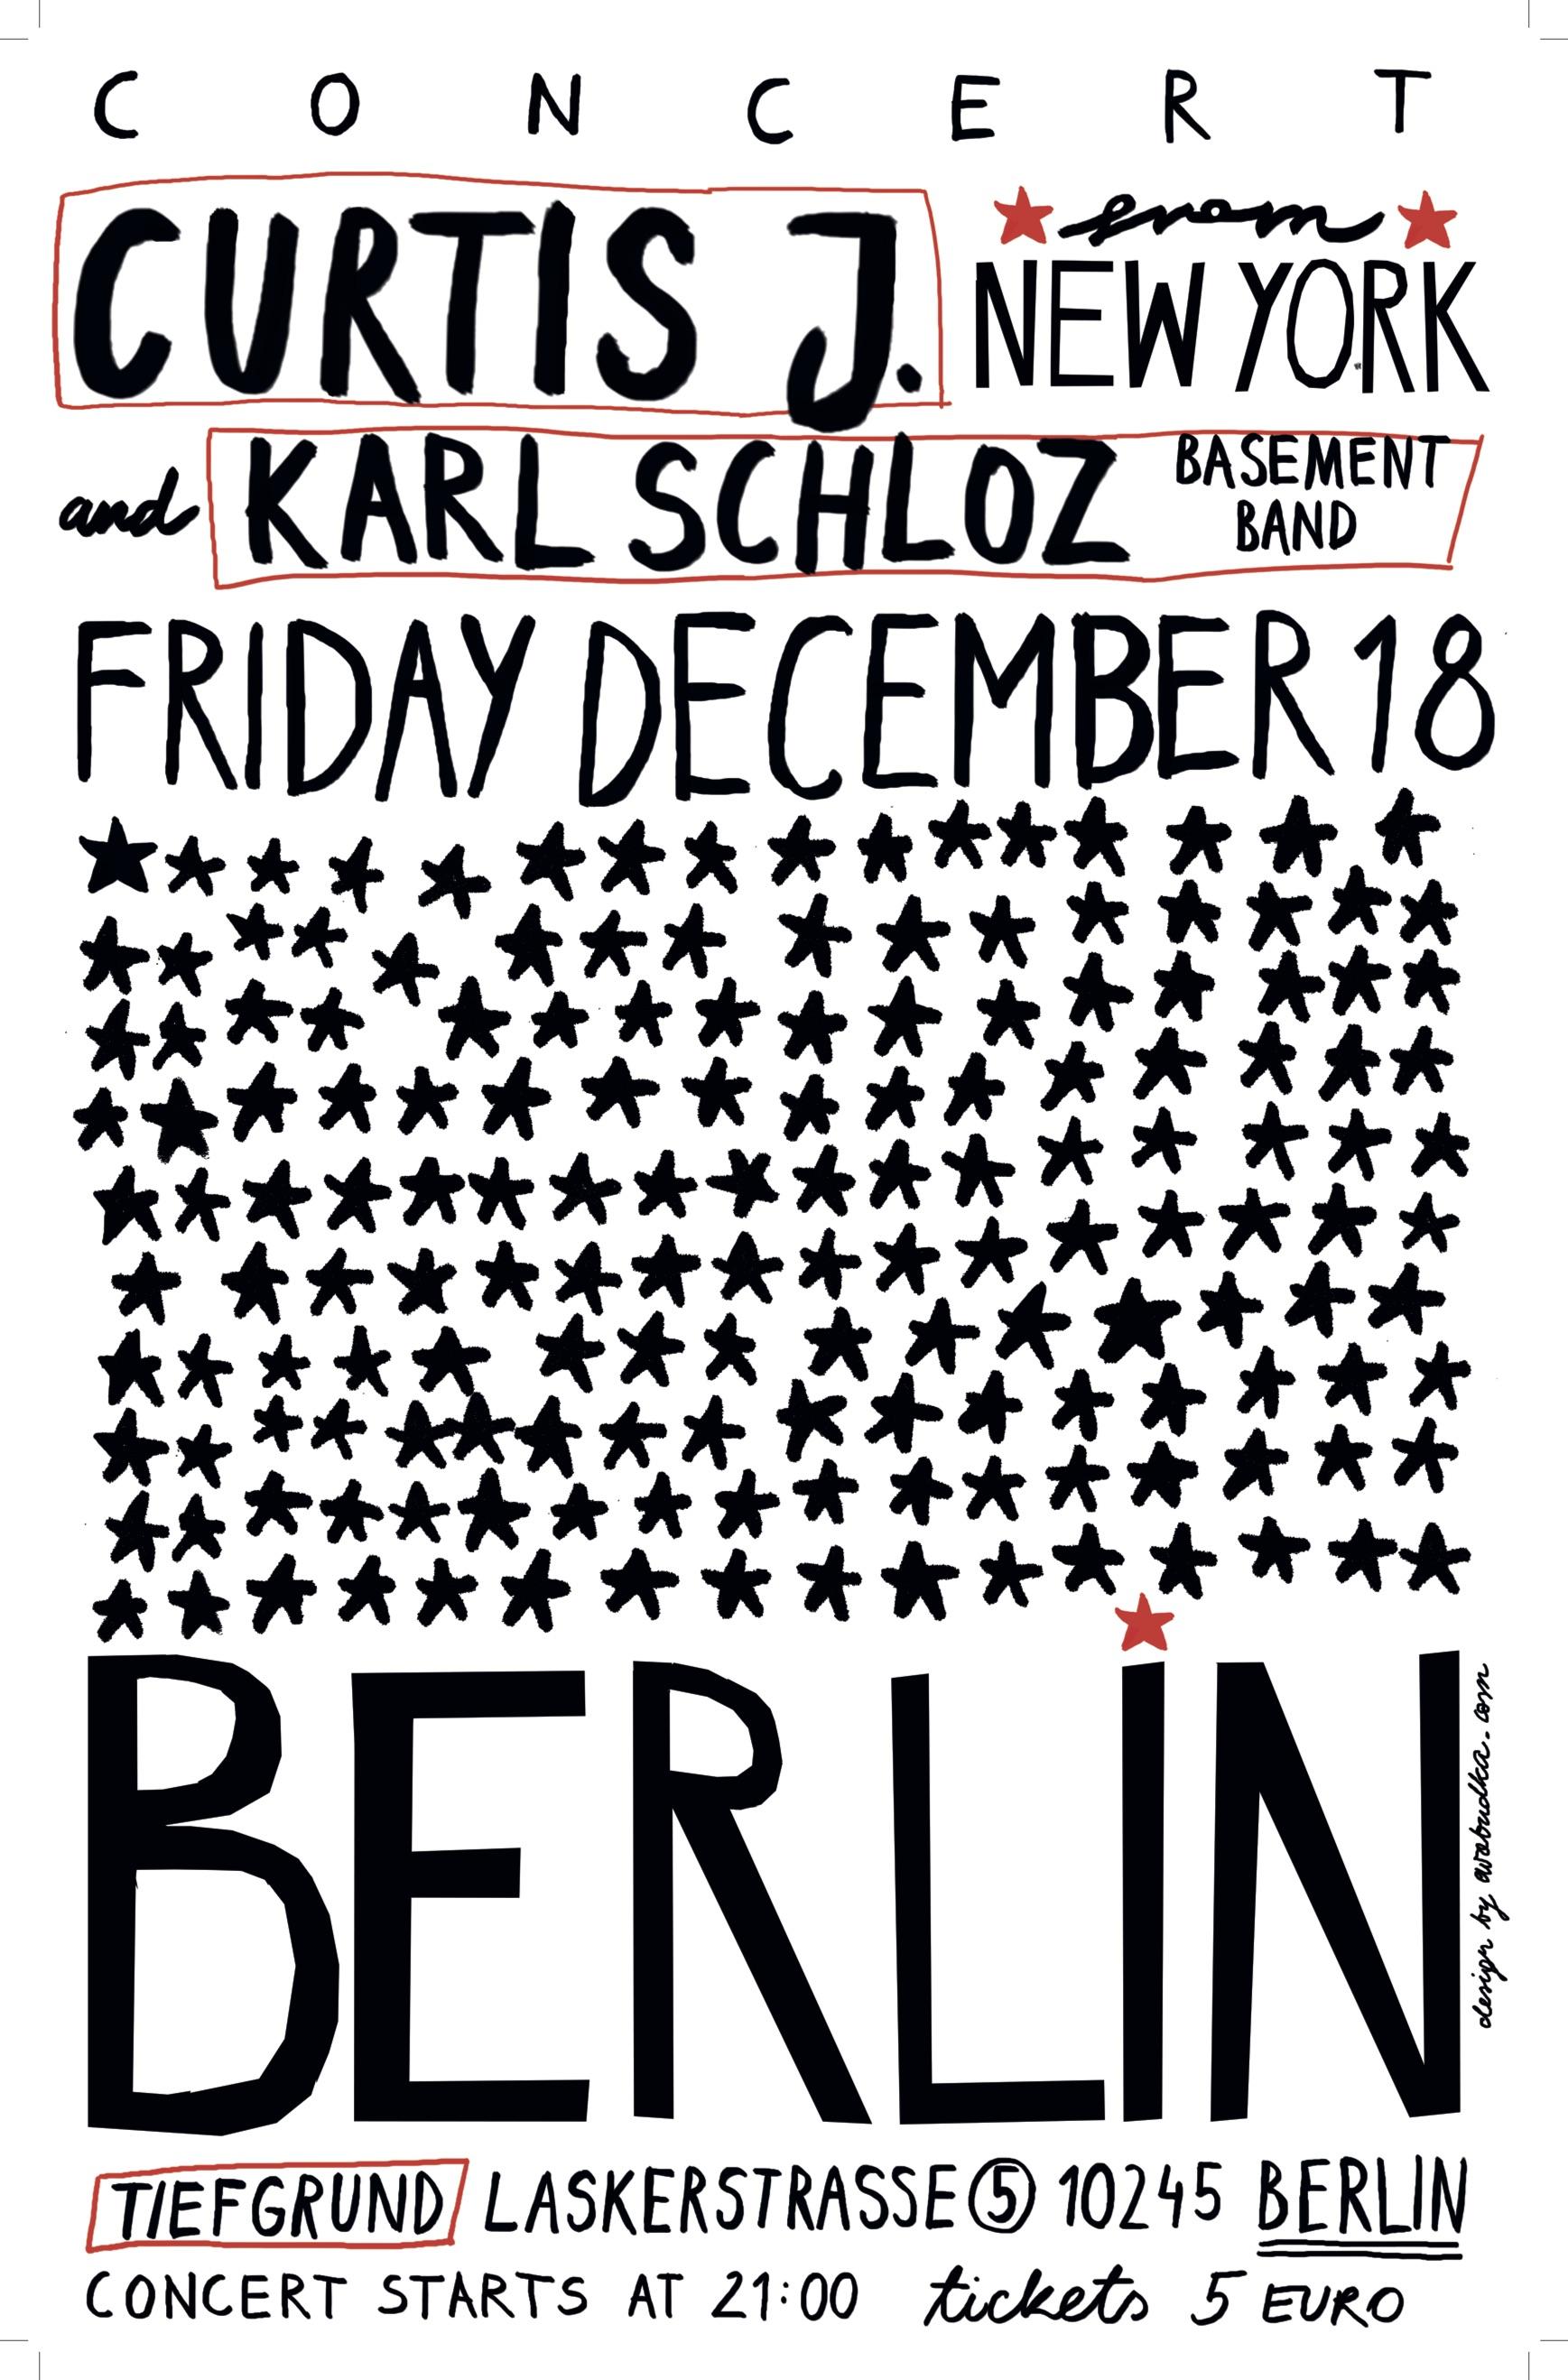 Tiefgrund | Berlin, Germany